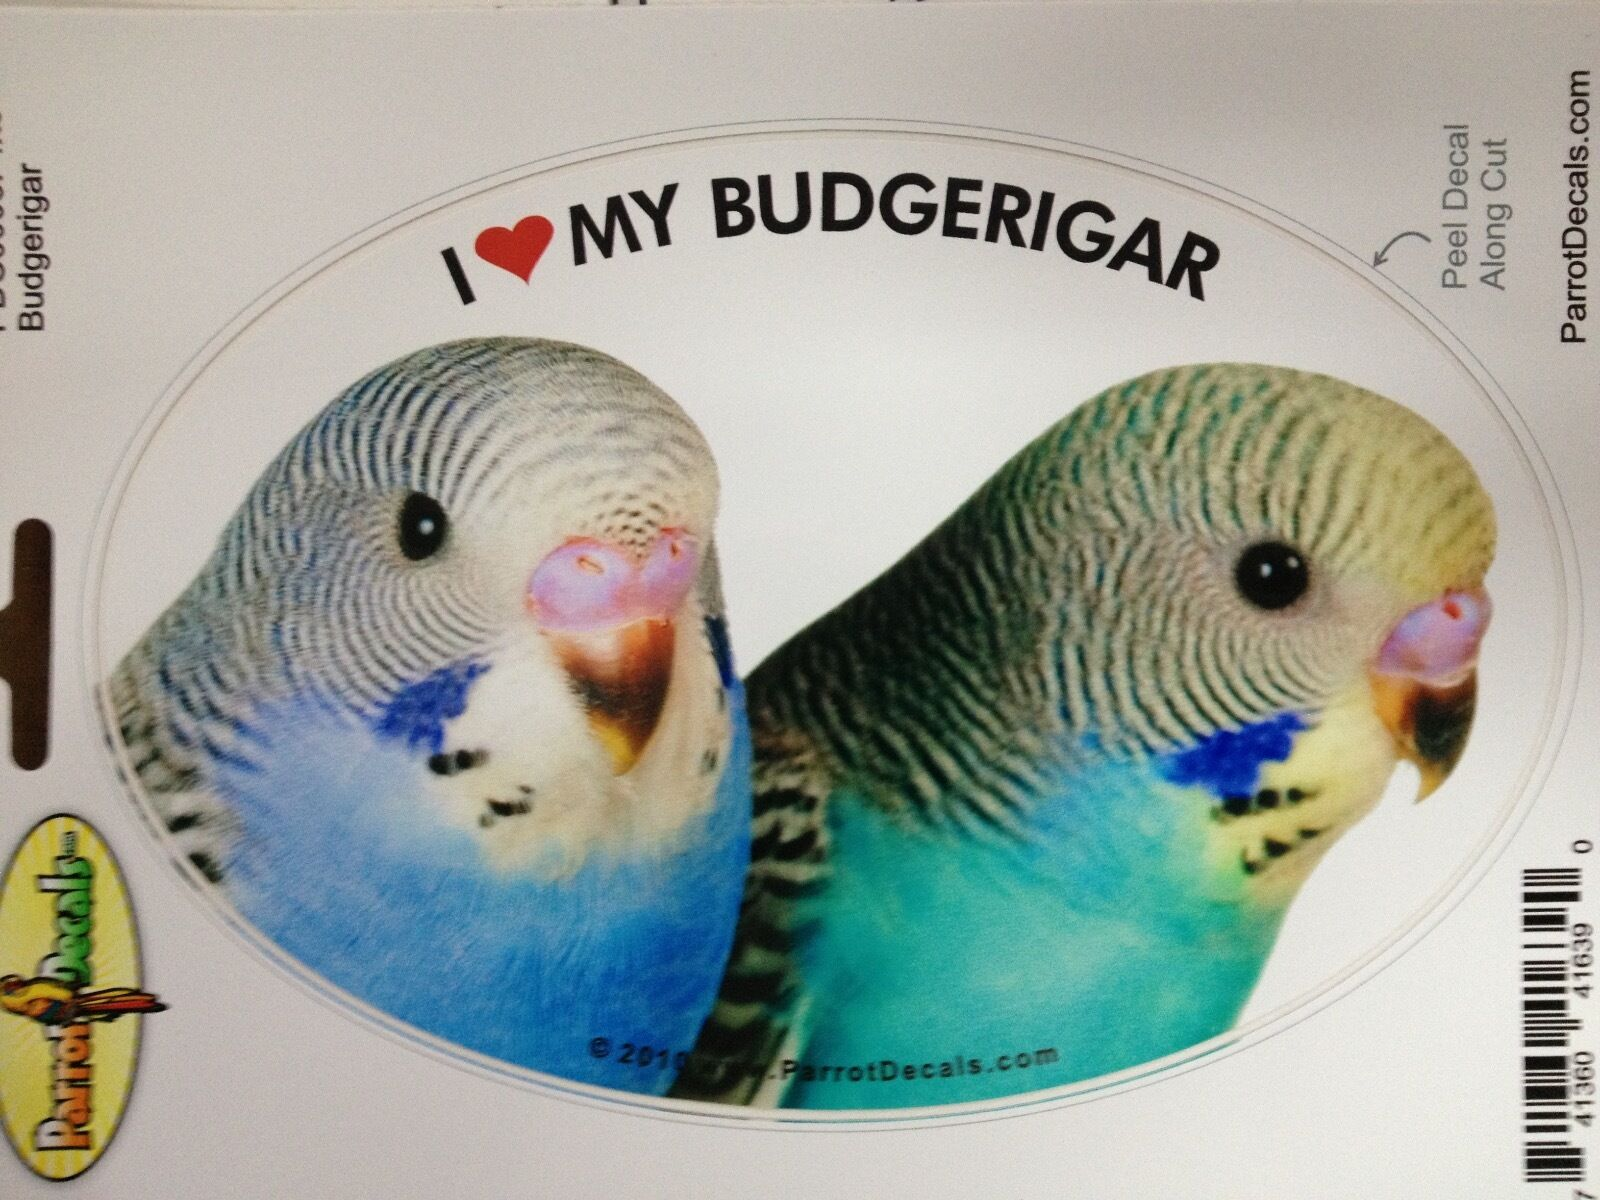 Female Eclectus Parrot Exotic Bird Vinyl Decal Bumper Sticker